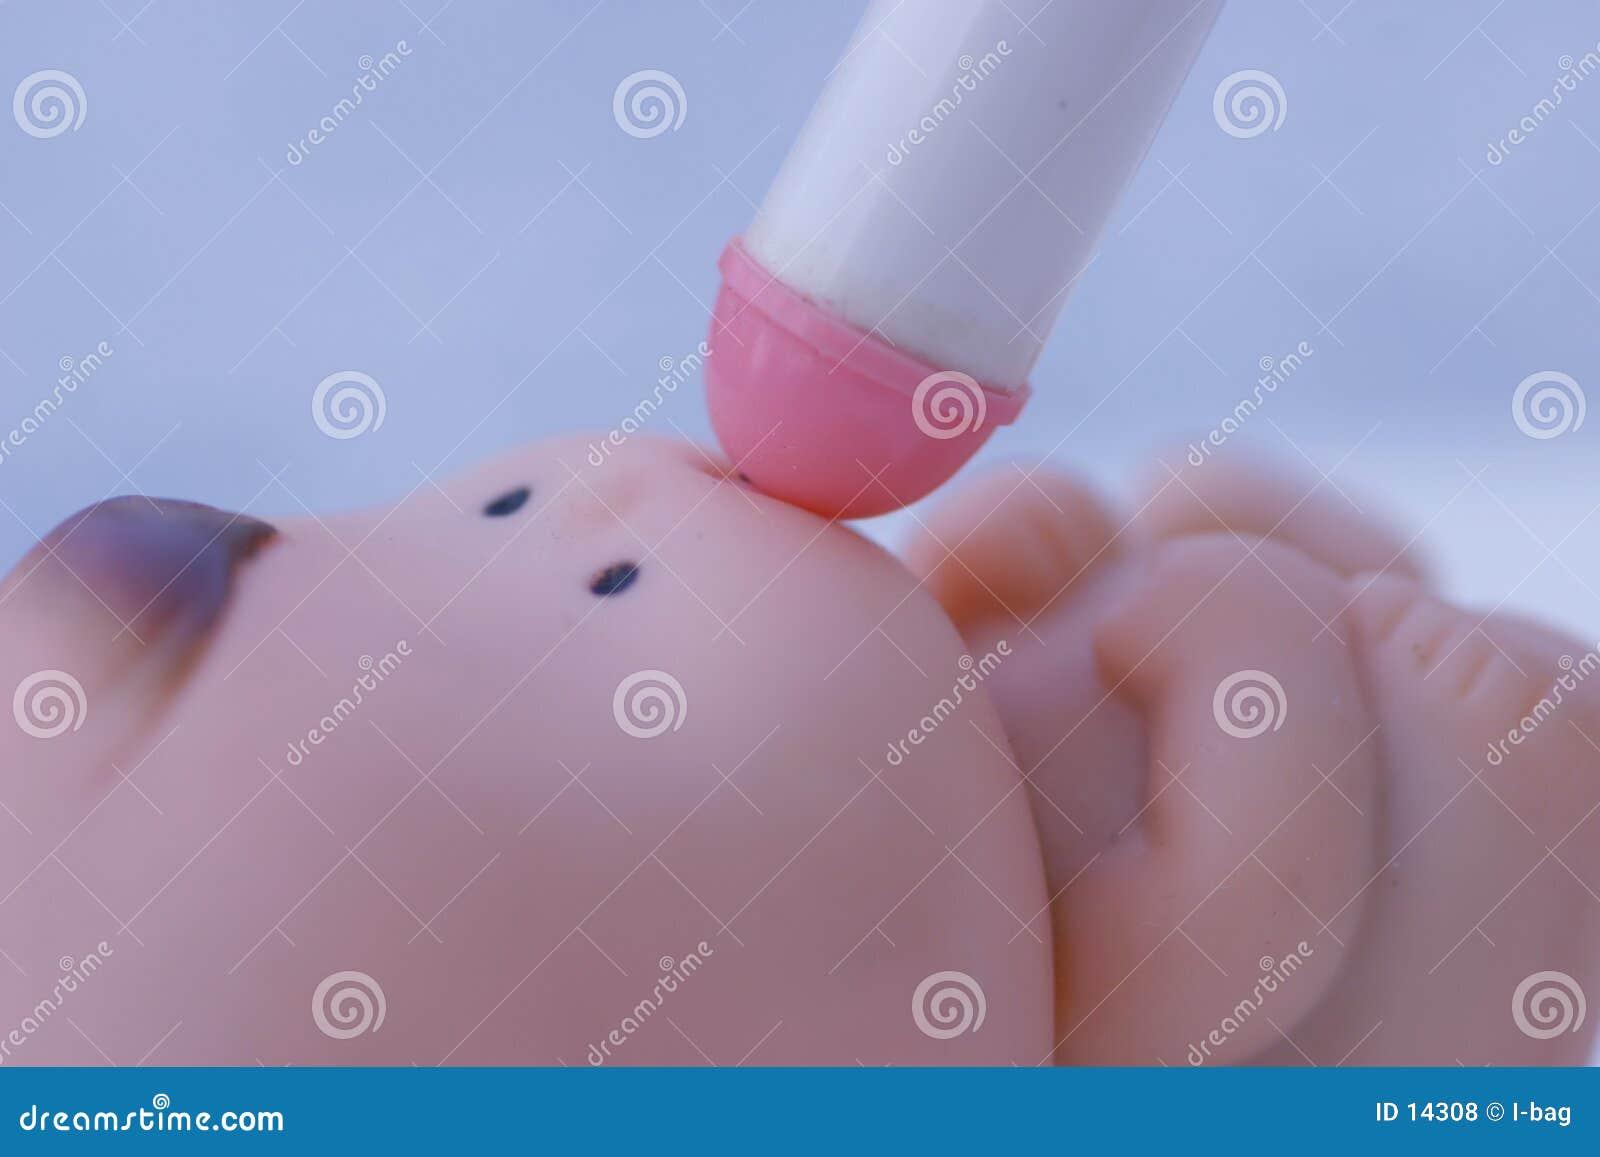 Spielzeugschätzchengetränk